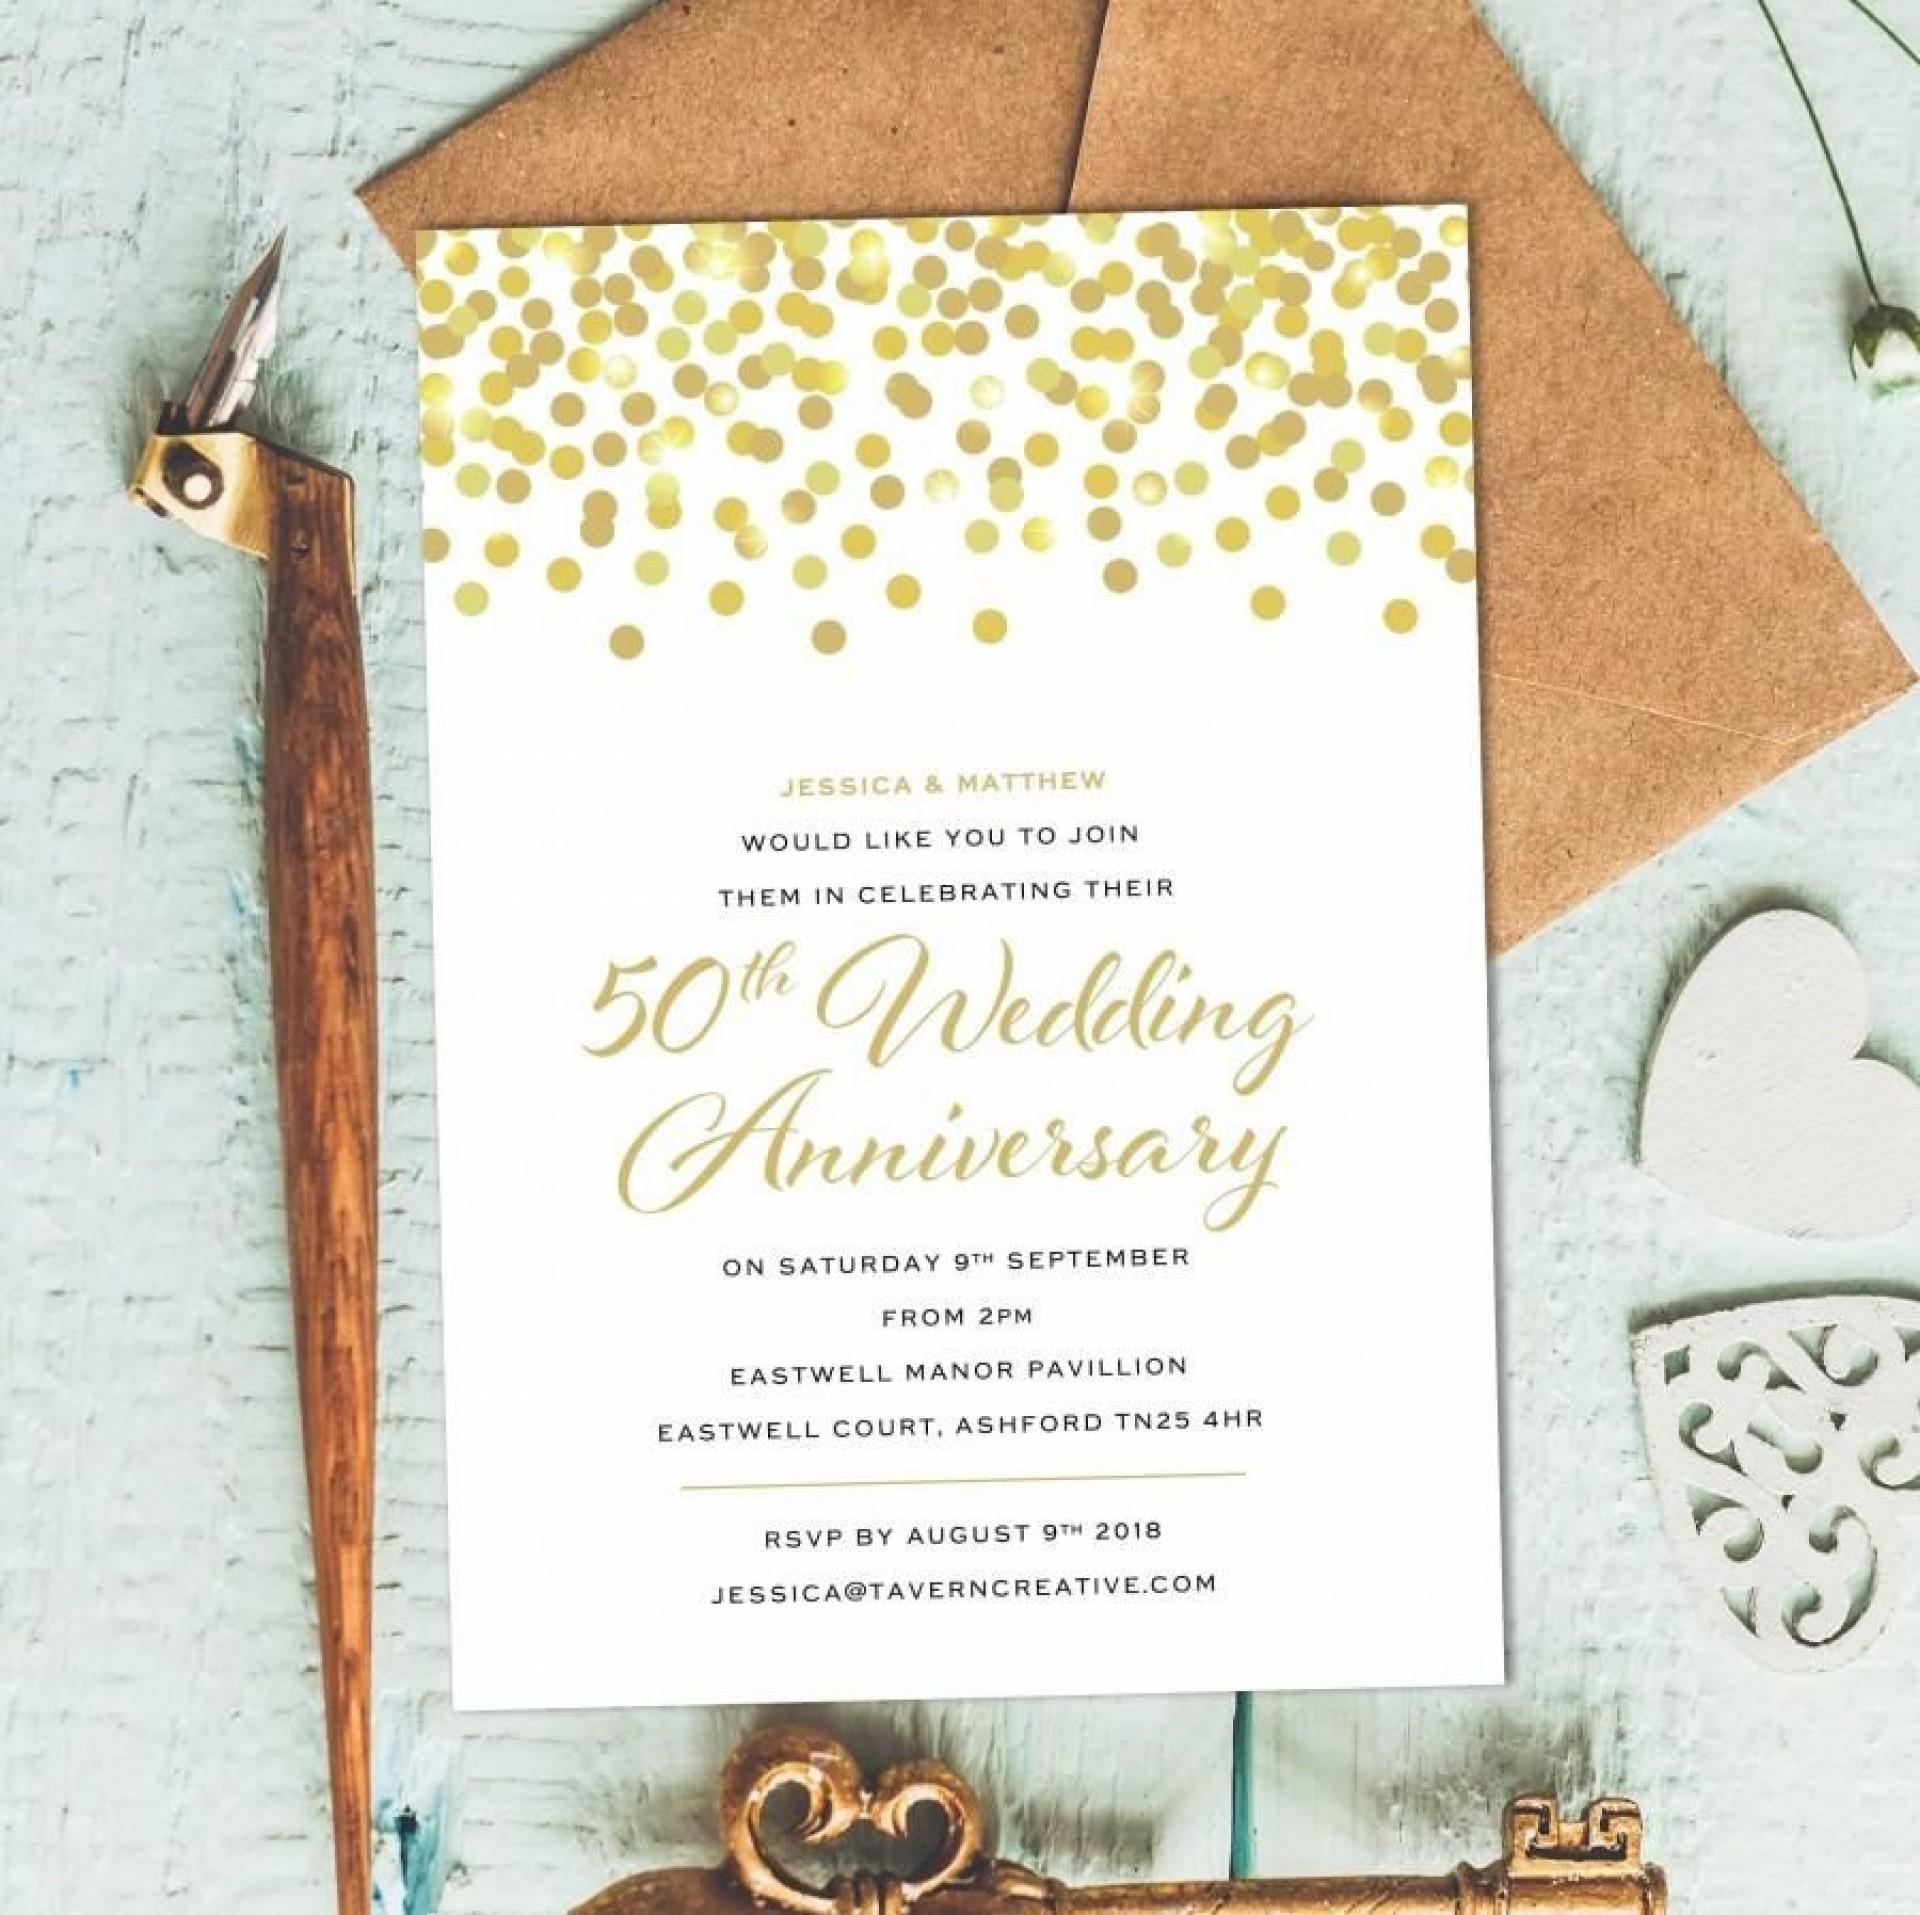 003 Unusual 50th Anniversary Invitation Template Free High Definition  Download Golden Wedding1920